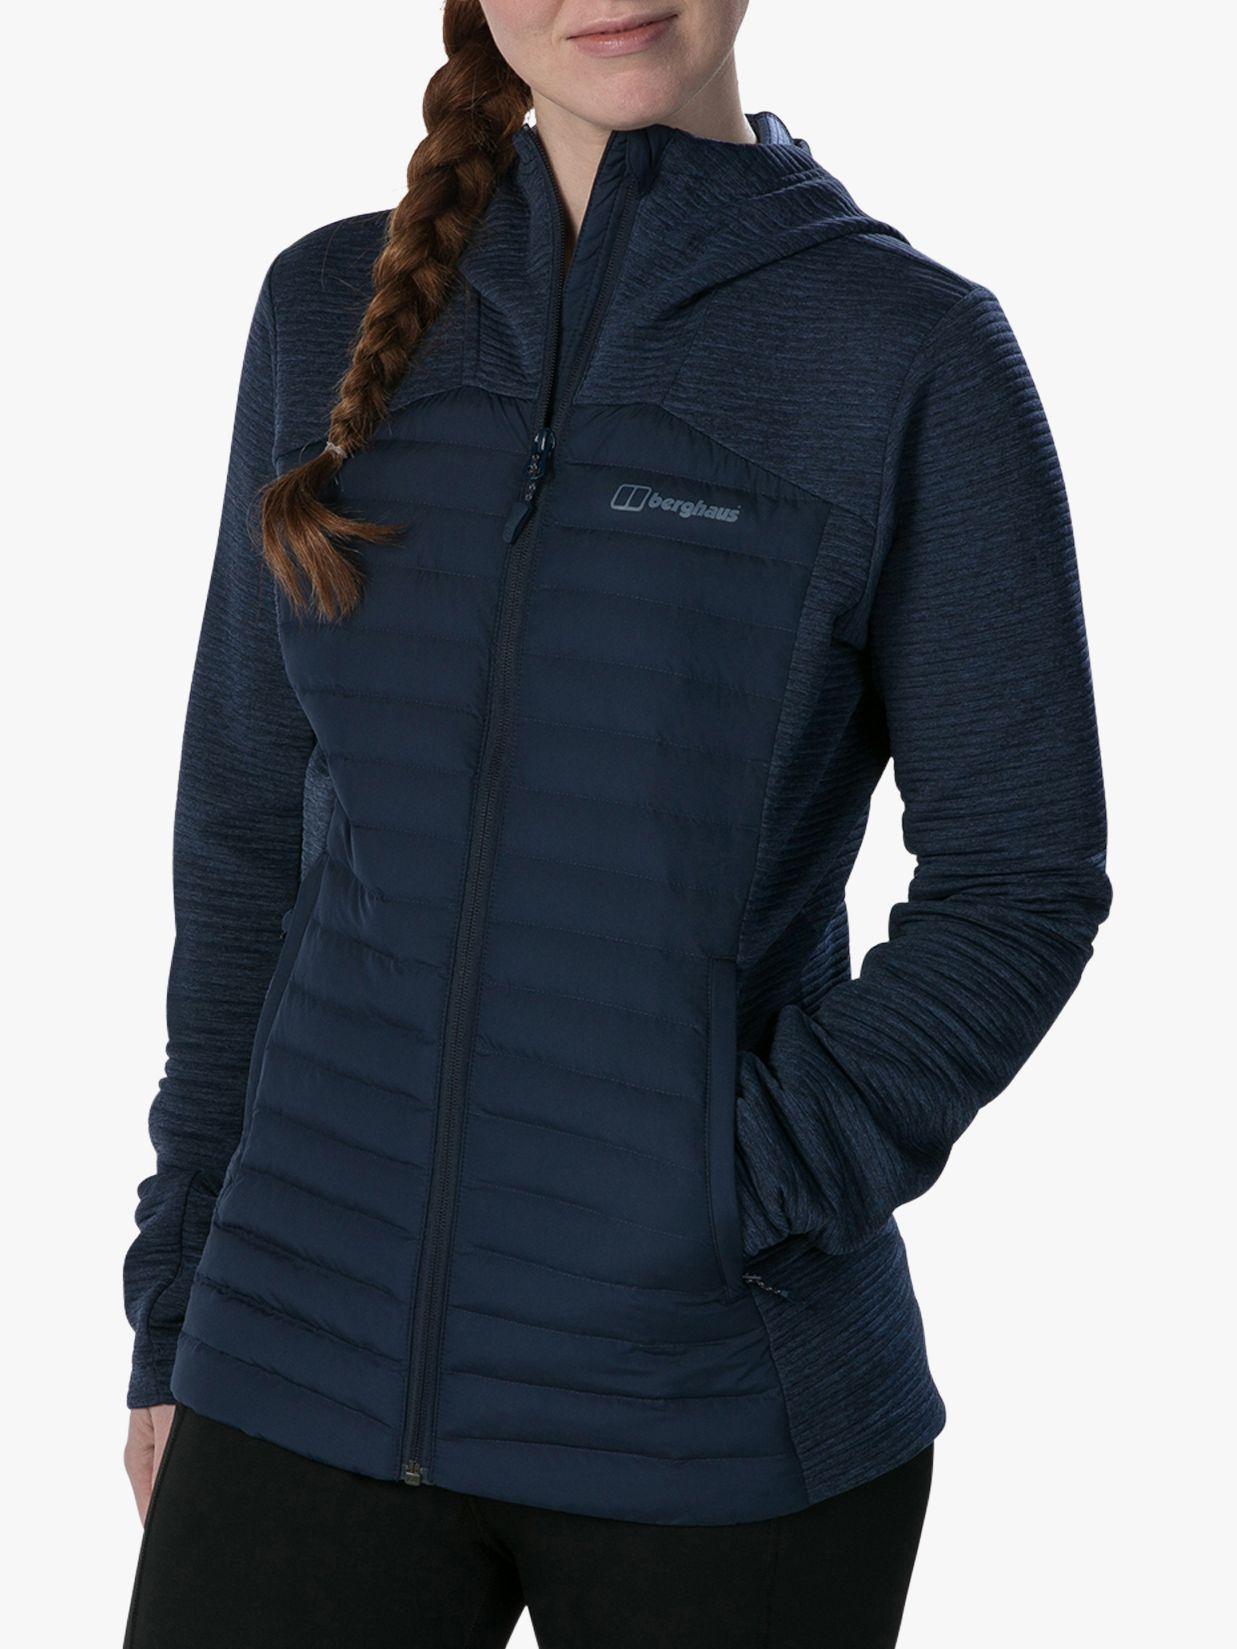 Berghaus Berghaus Nula Hybrid Women's Water Resistant Jacket, Dusk